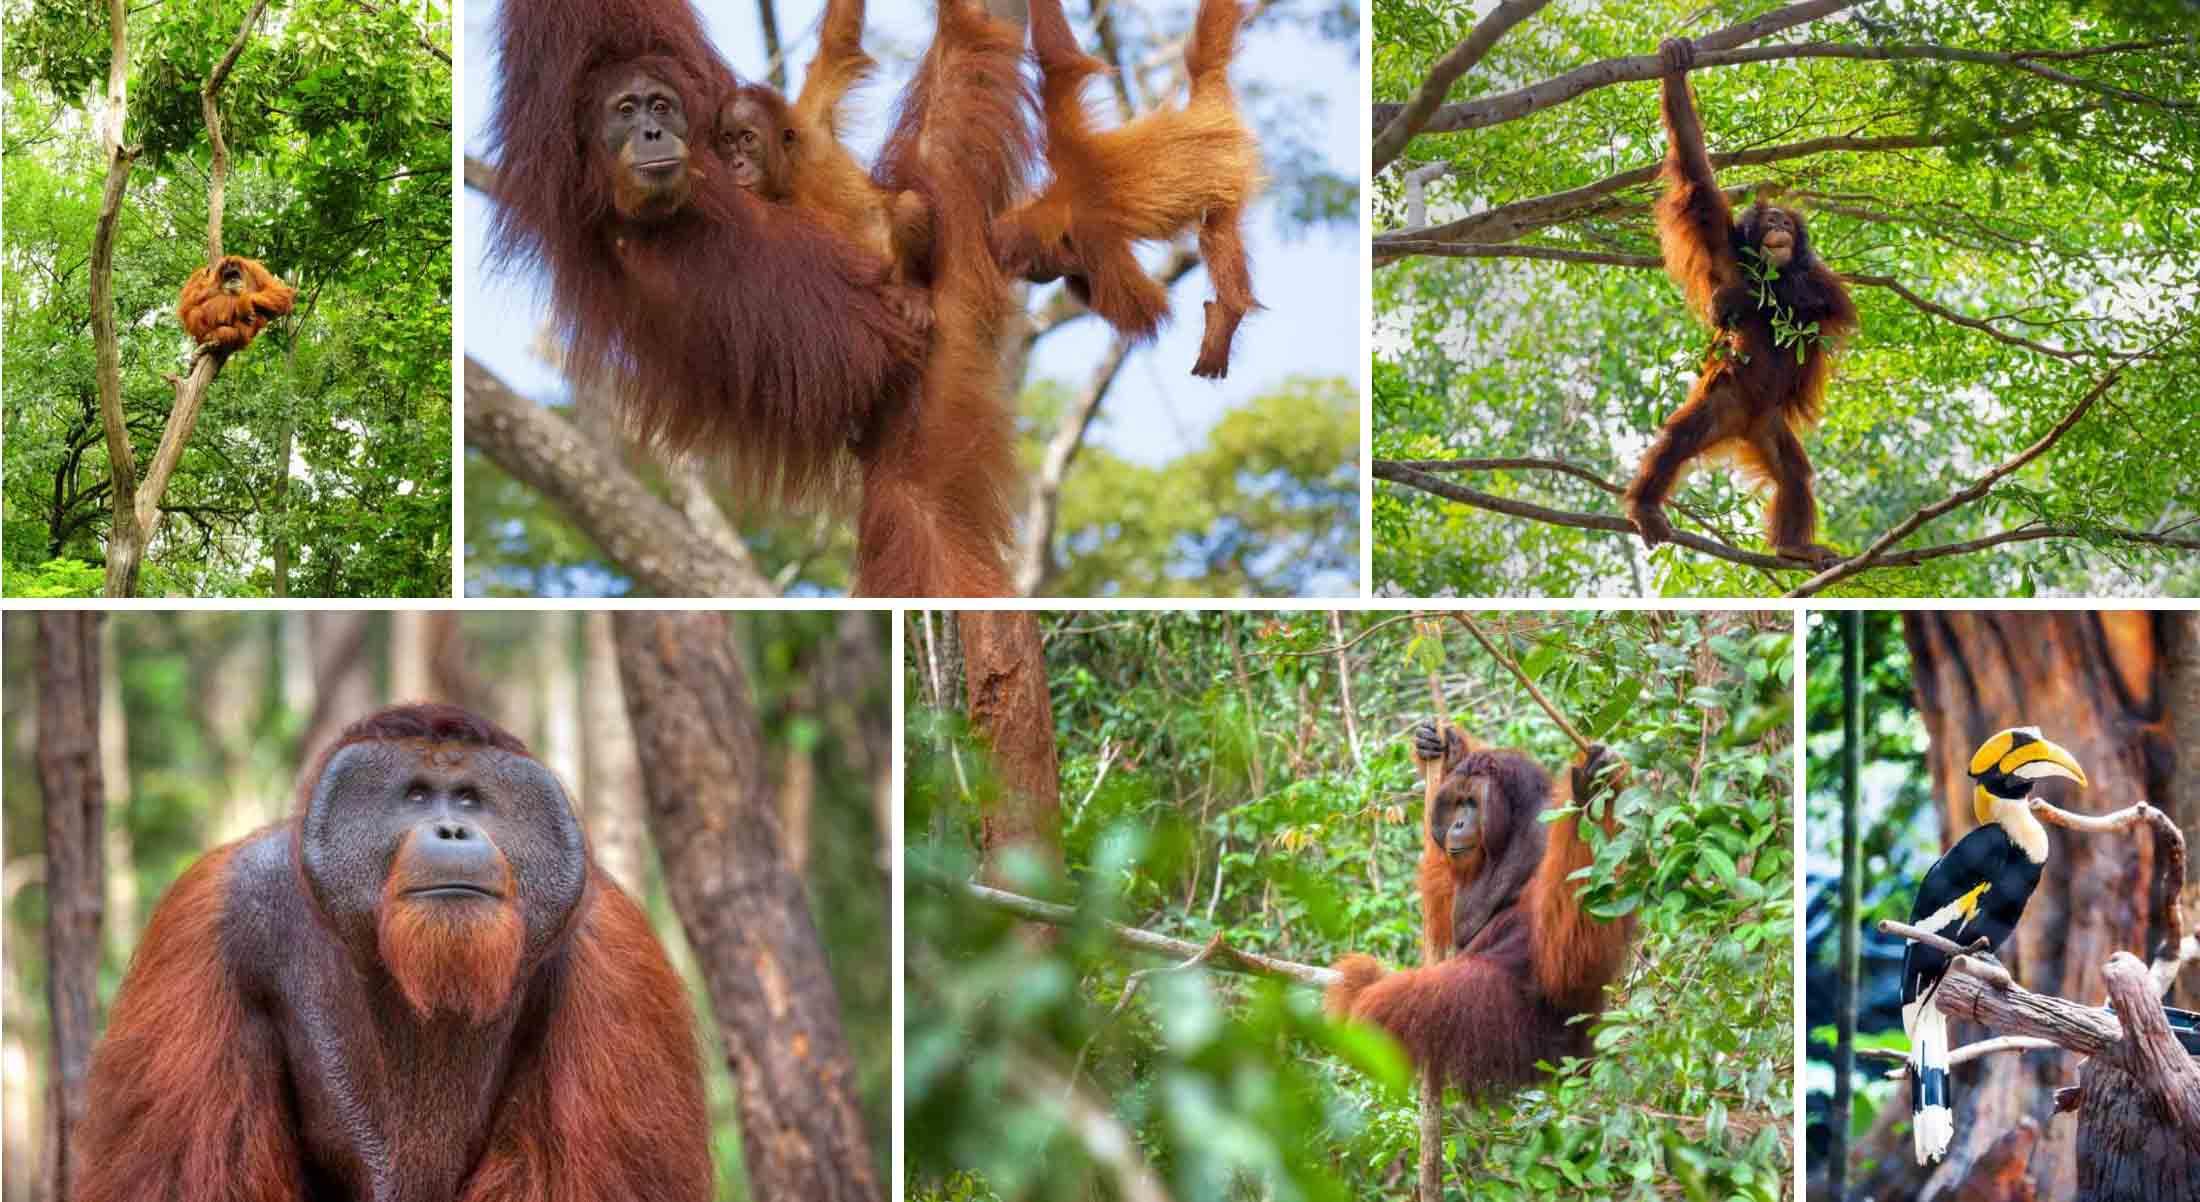 the-mighty-orangutans-of-borneo-gallery-2